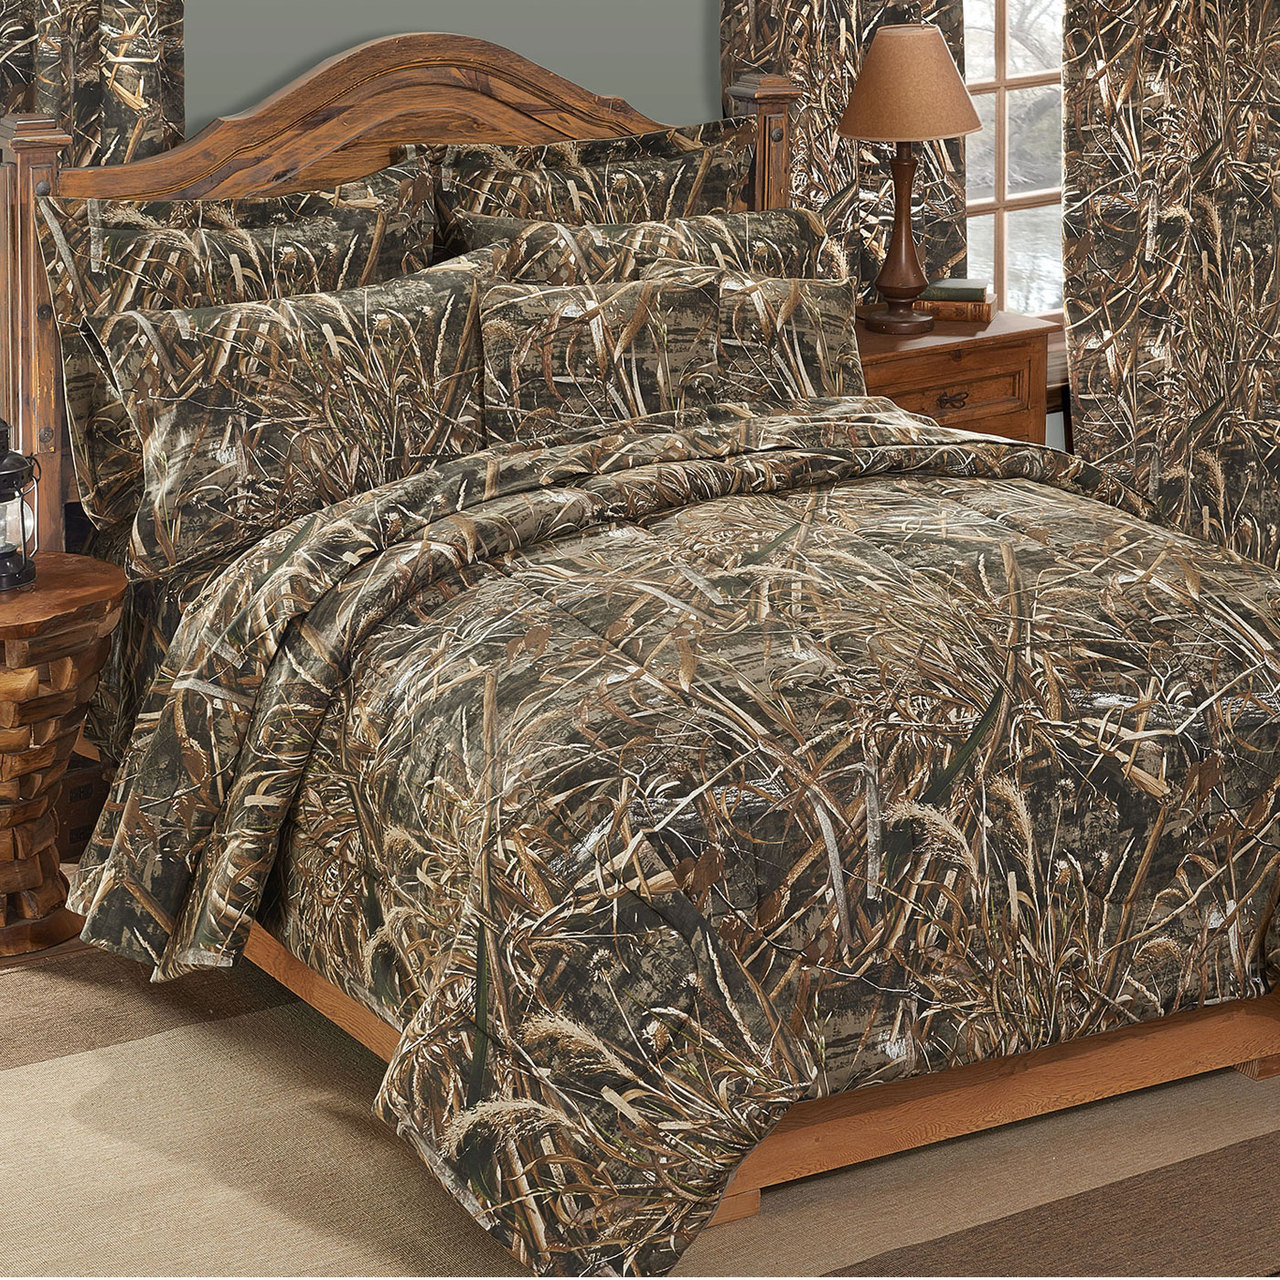 Realtree Max-5 Camo Comforter Sets | Free Shipping - Camo Bedding